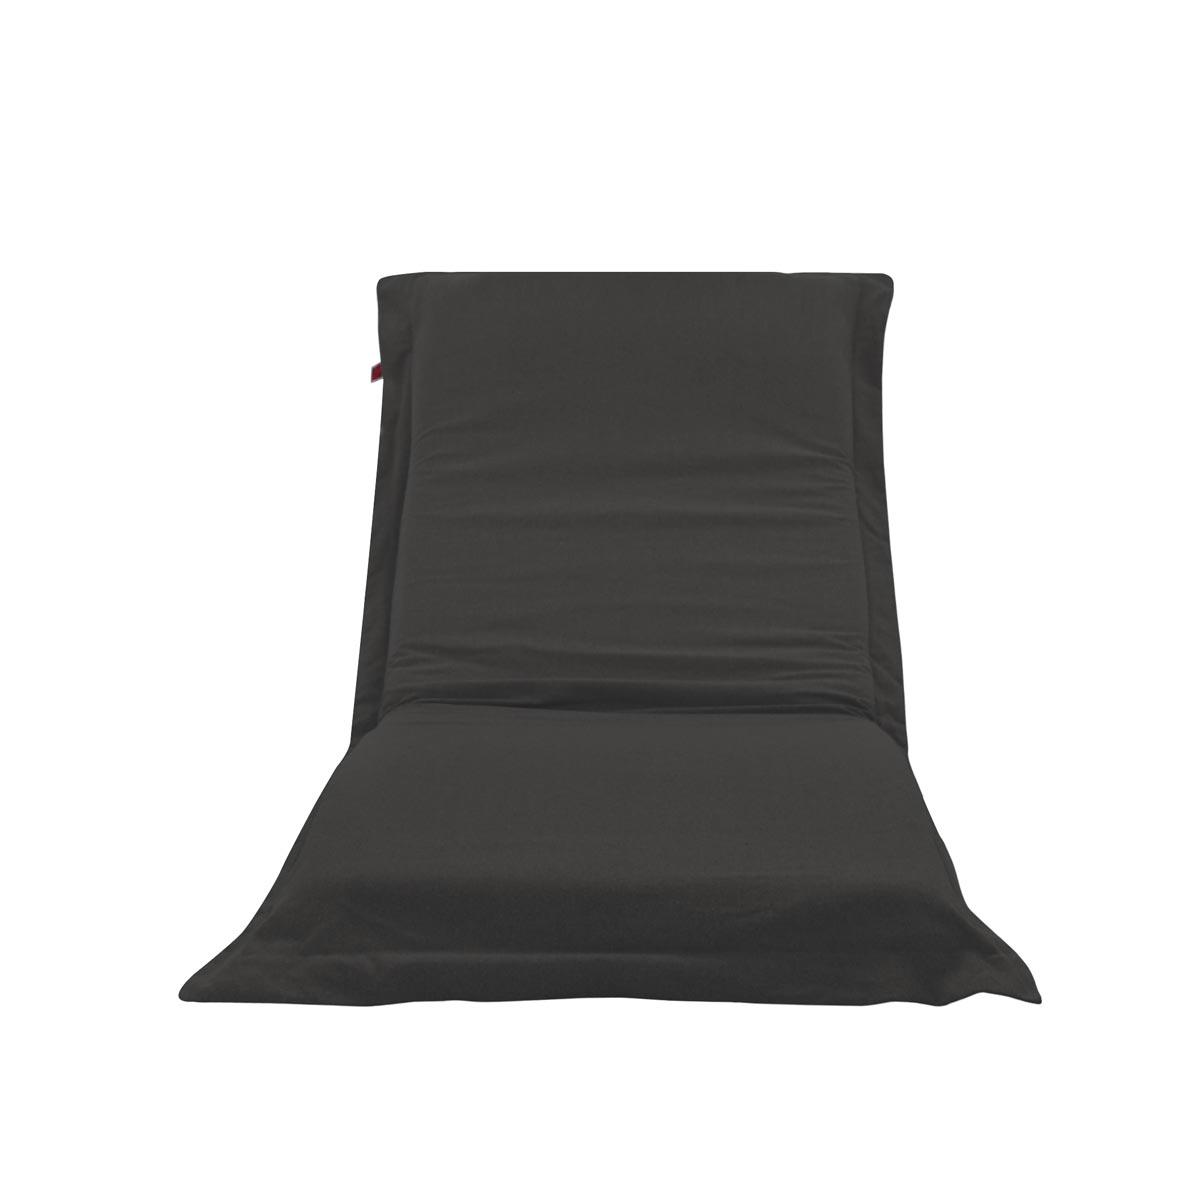 Pufe ClicClac Uno Lounge Tecido Ecolona Asfalto 01 02